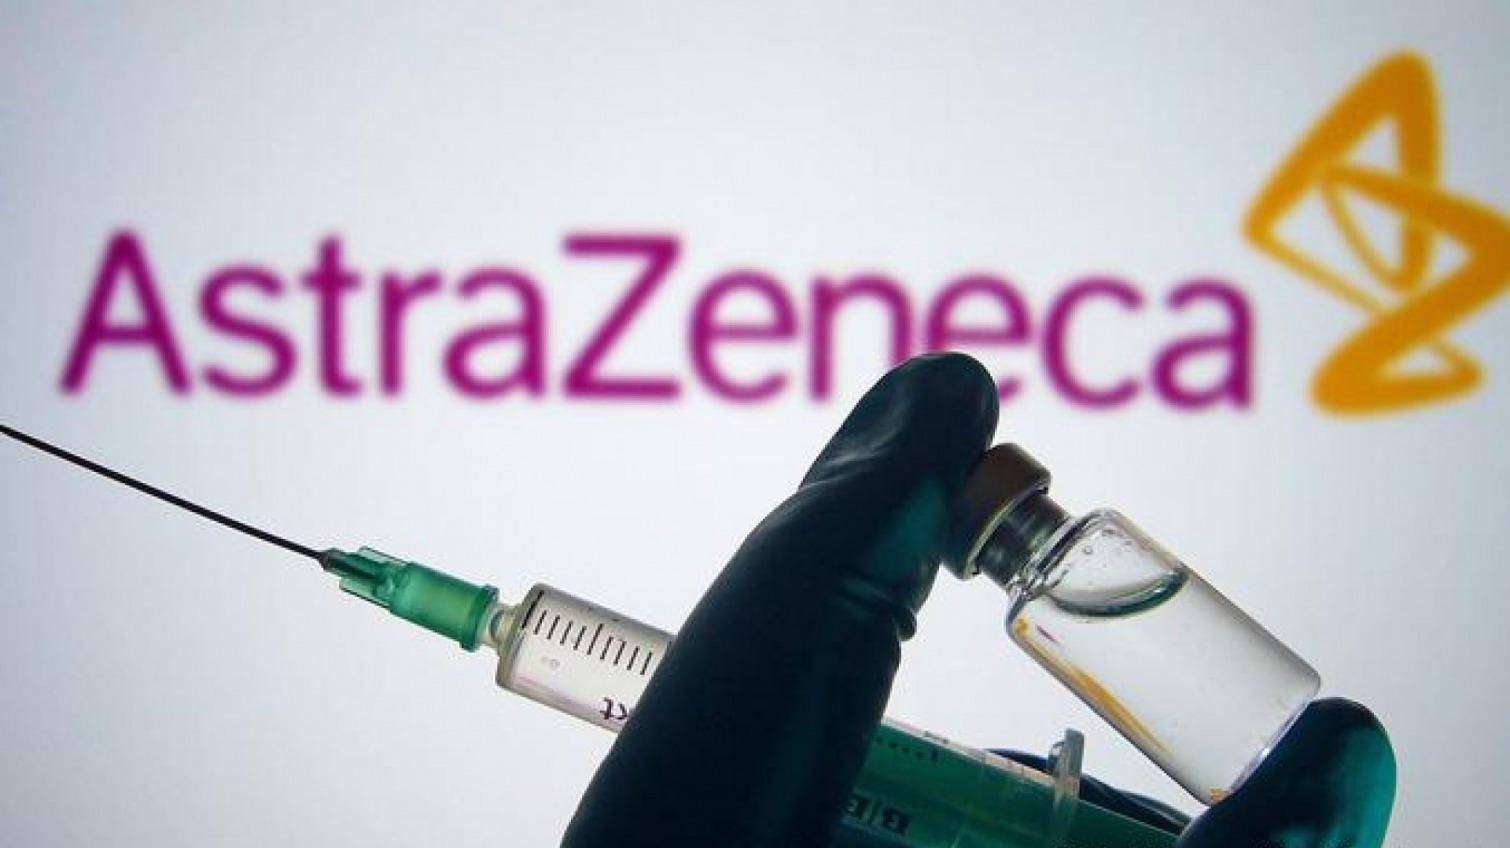 Пандемия: восемь стран возобновили вакцинацию препаратом AstraZeneca «фото»